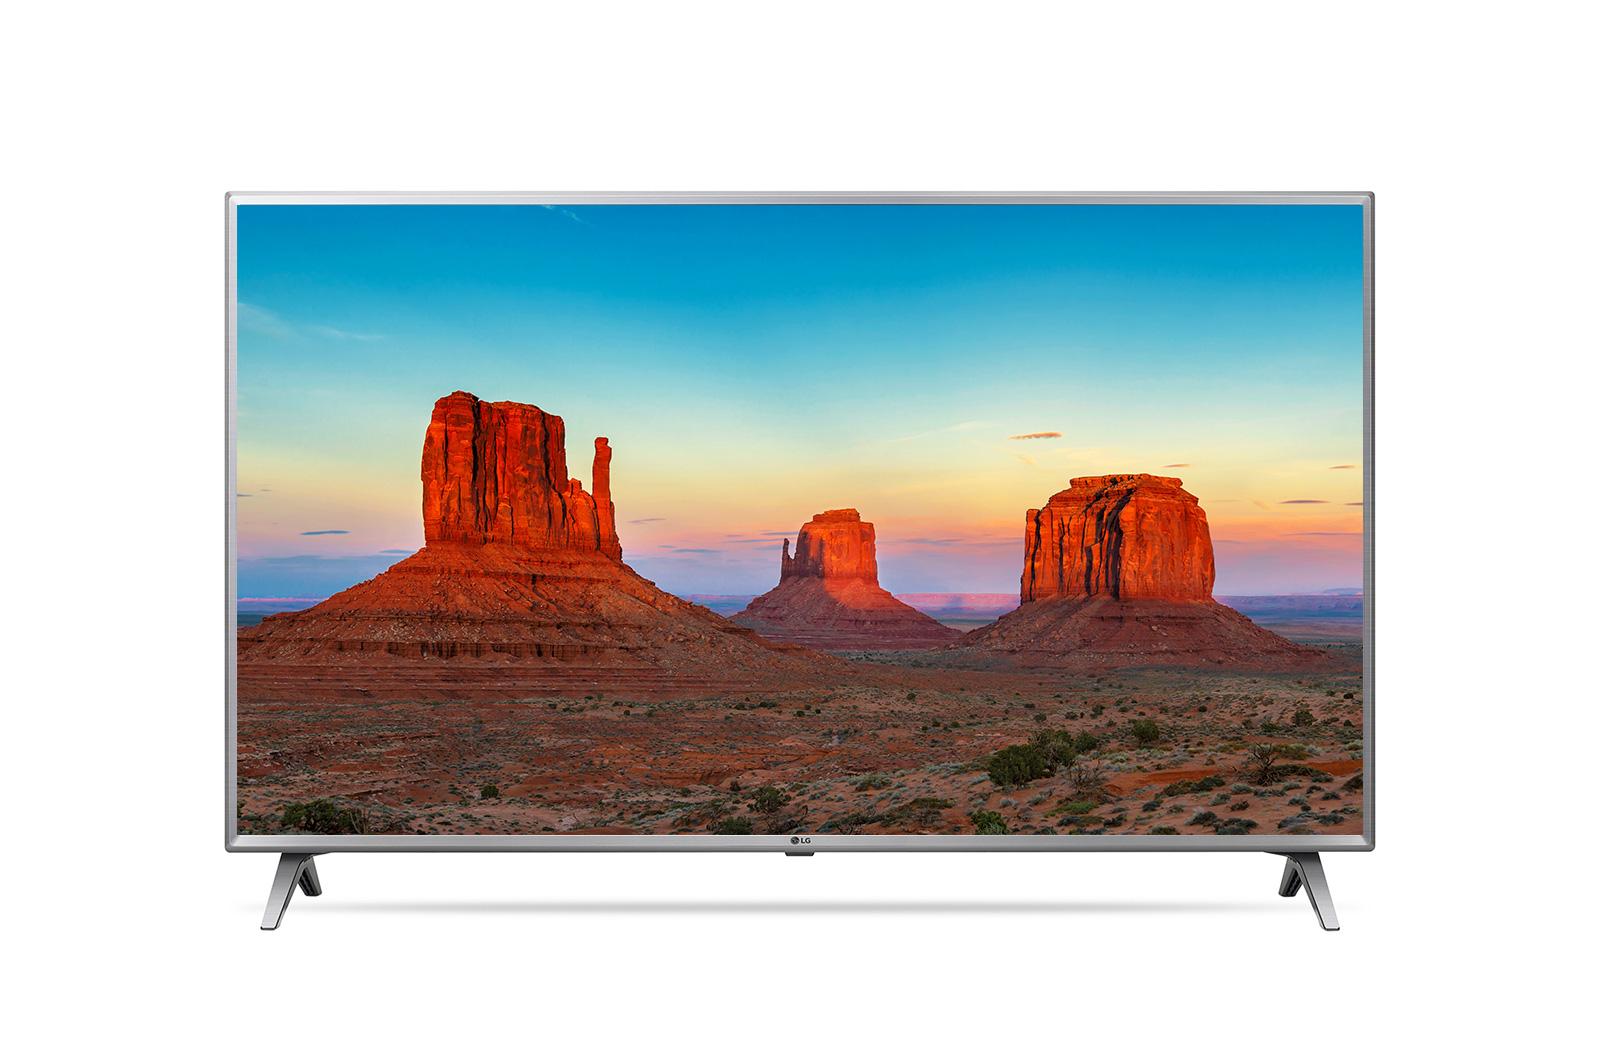 "LG 43UK6500PLA 43"" 4K Ultra HD Smart TV Wi-Fi Grey LED TV"